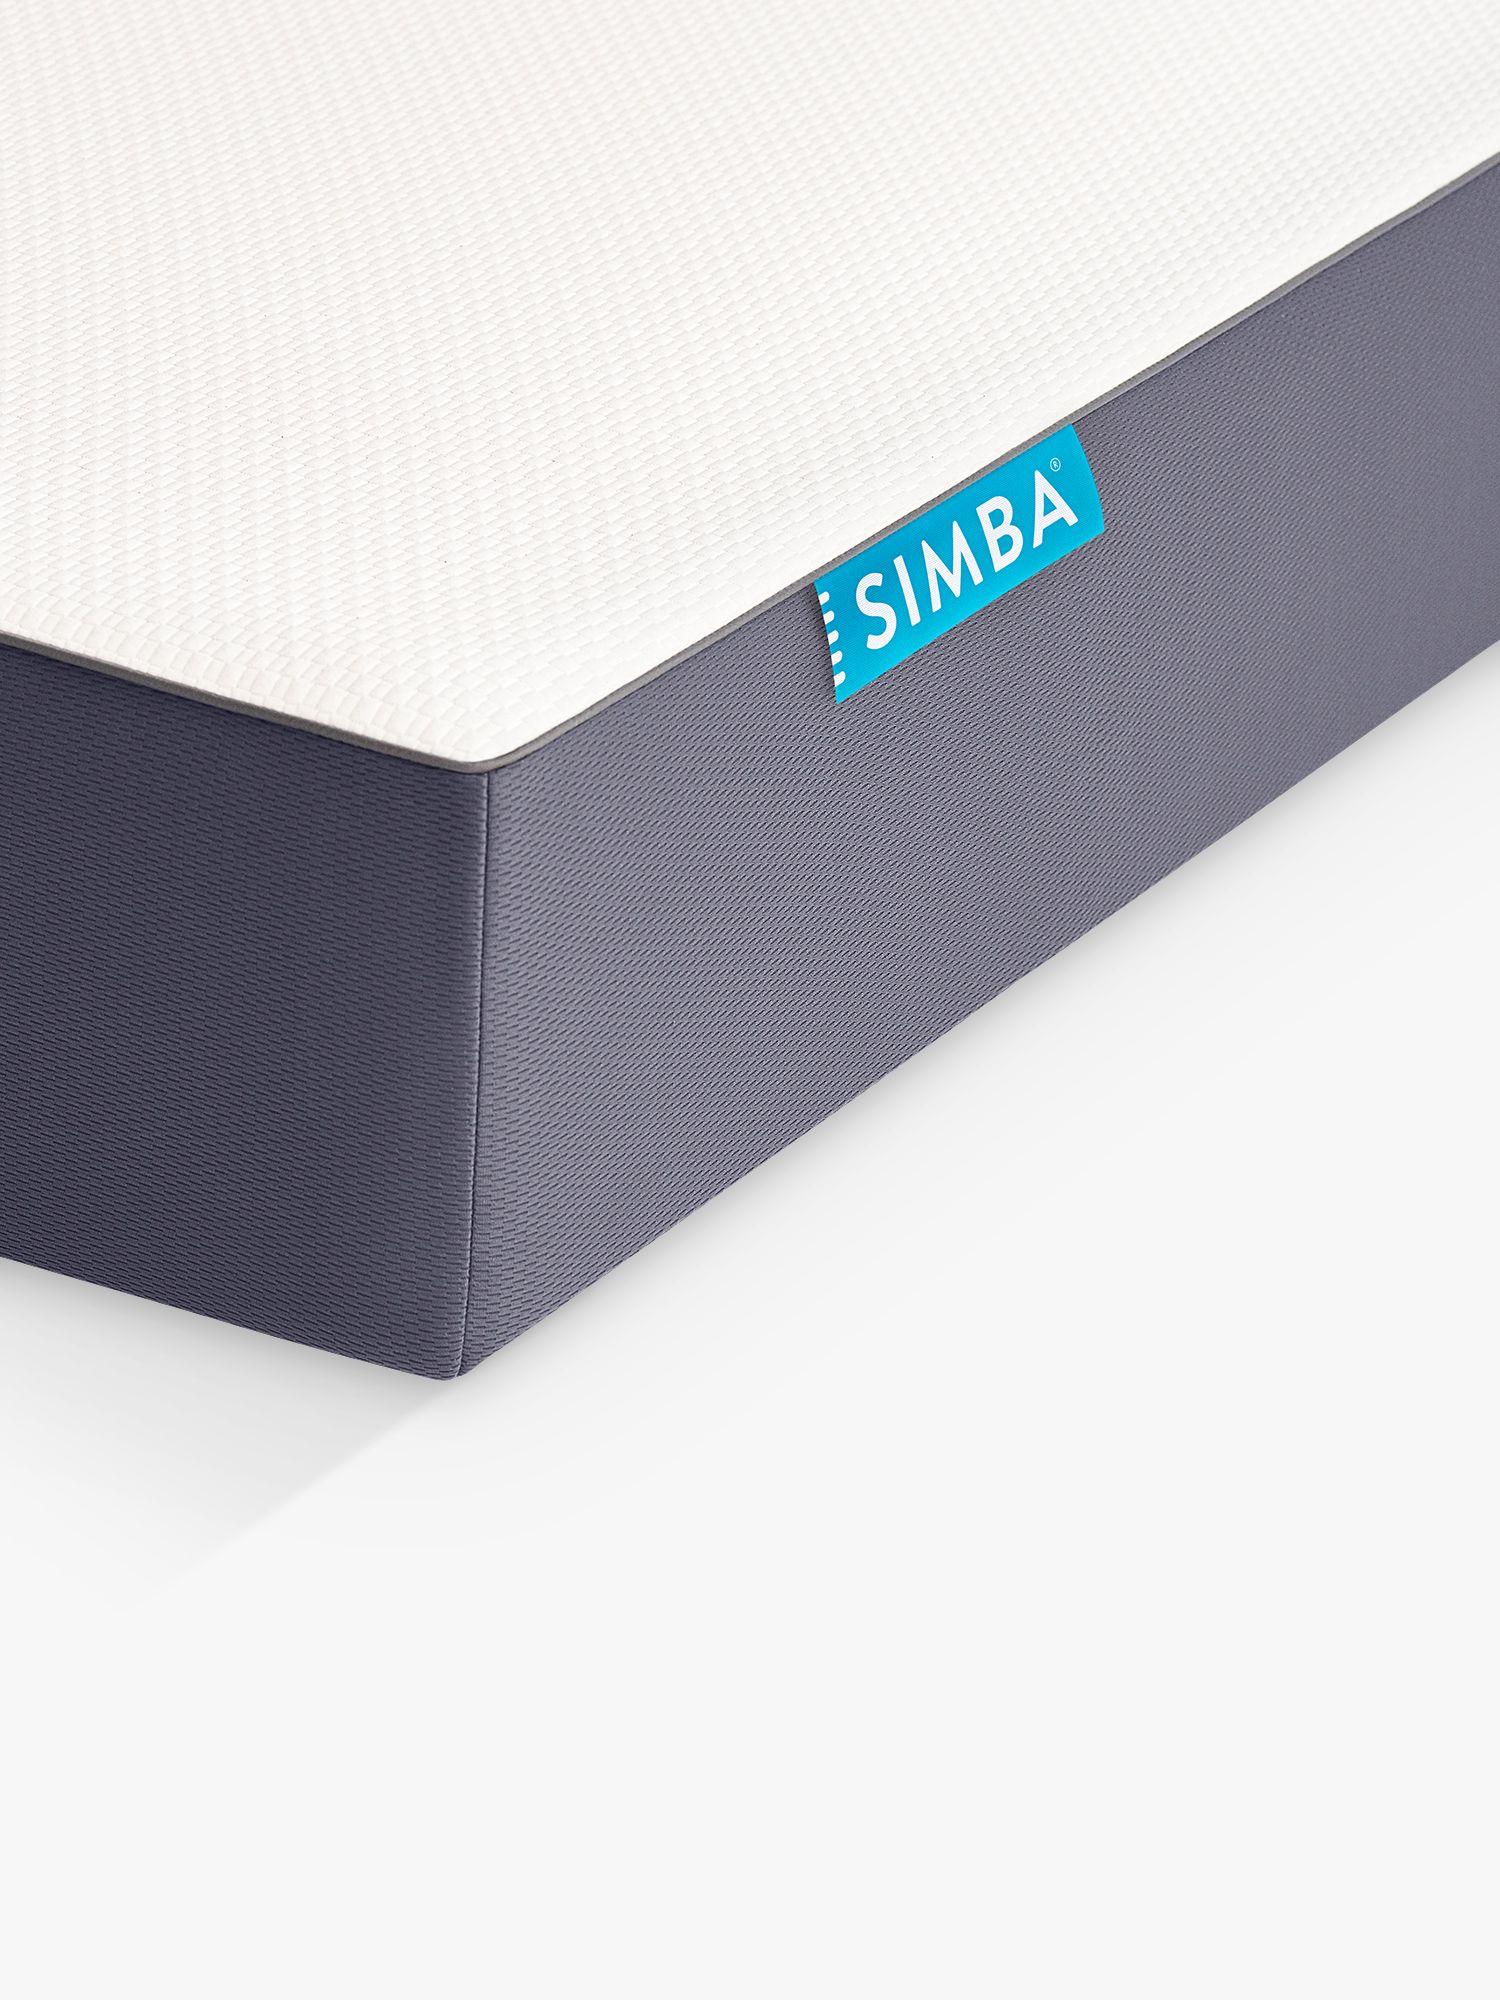 Simba SIMBA Hybrid Memory Foam Pocket Spring Mattress, Double